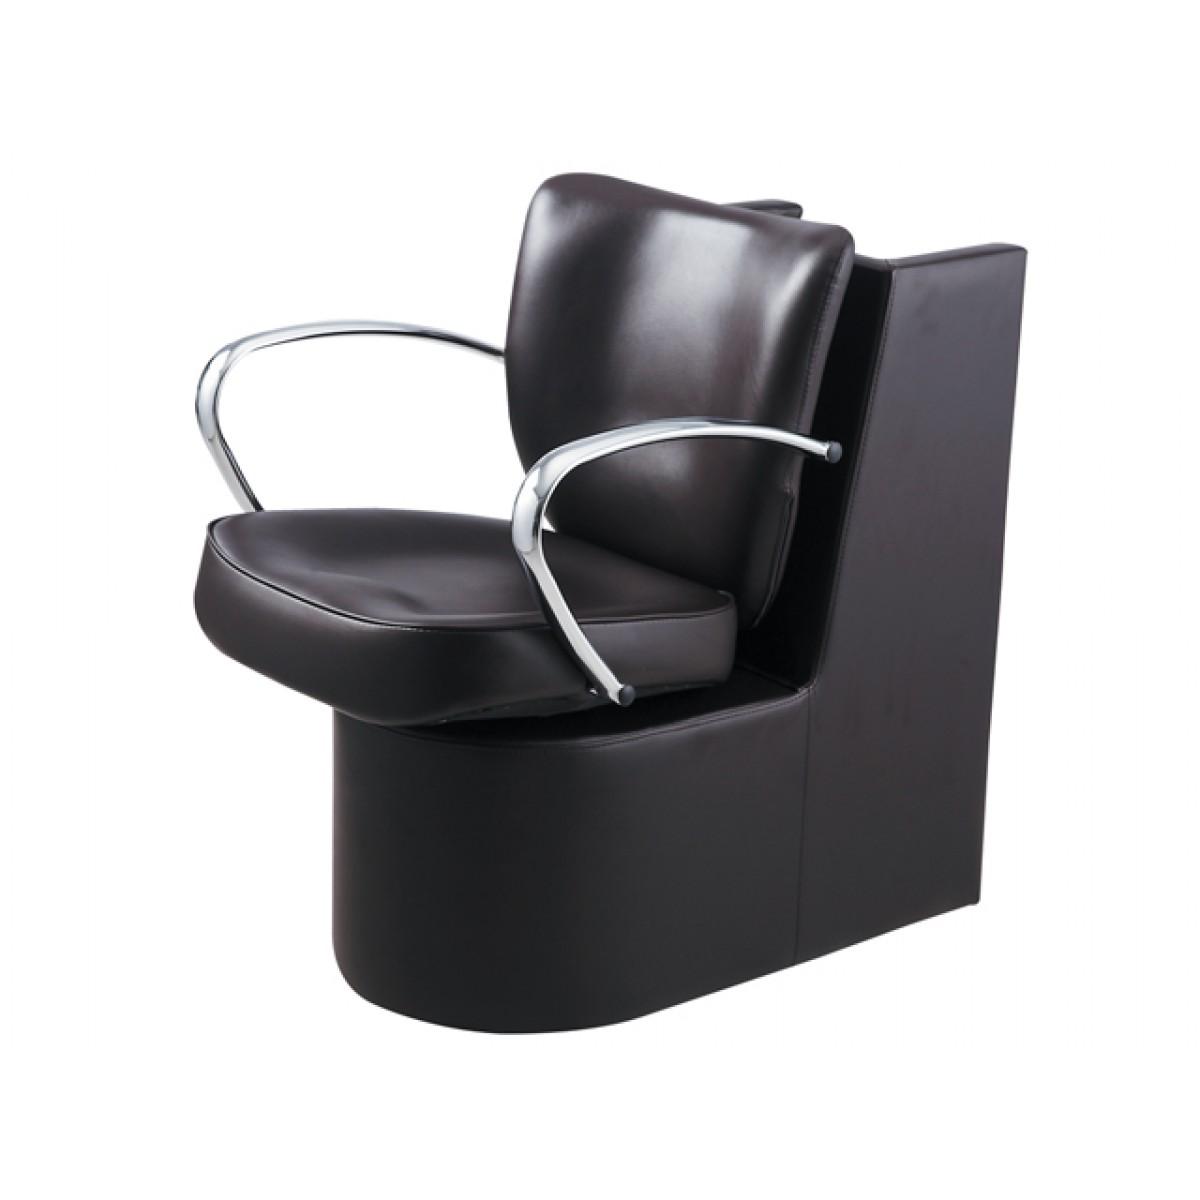 """VENUS"" Dryer Chair, Hair Salon Dryers, Hair Chairs with Dryer"